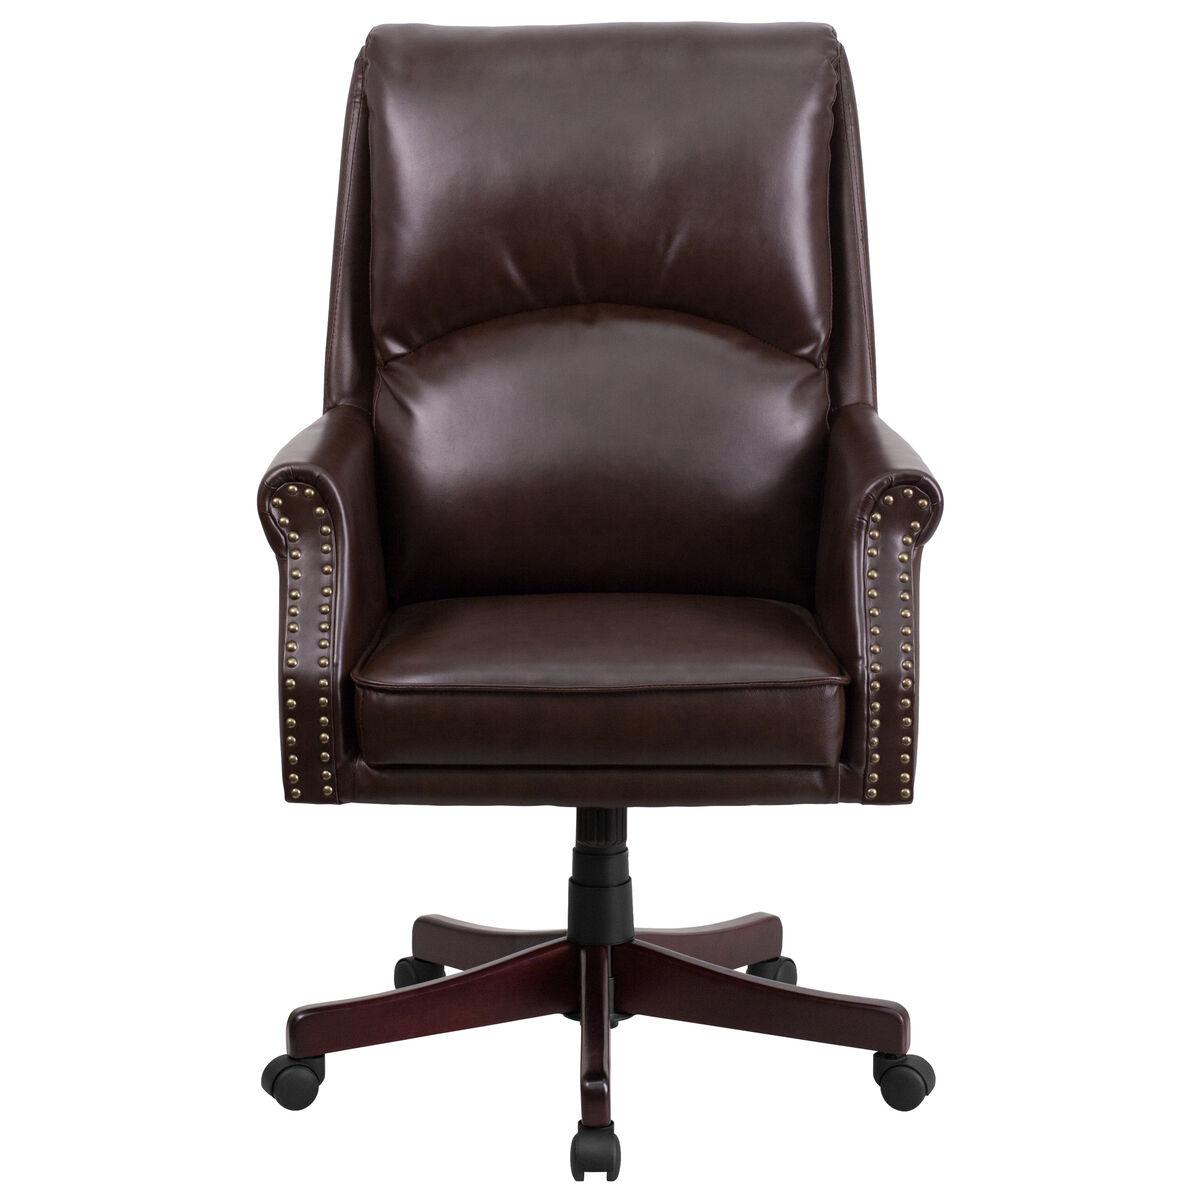 Flash furniture bt 9025h 2 bn gg for H furniture ww chair